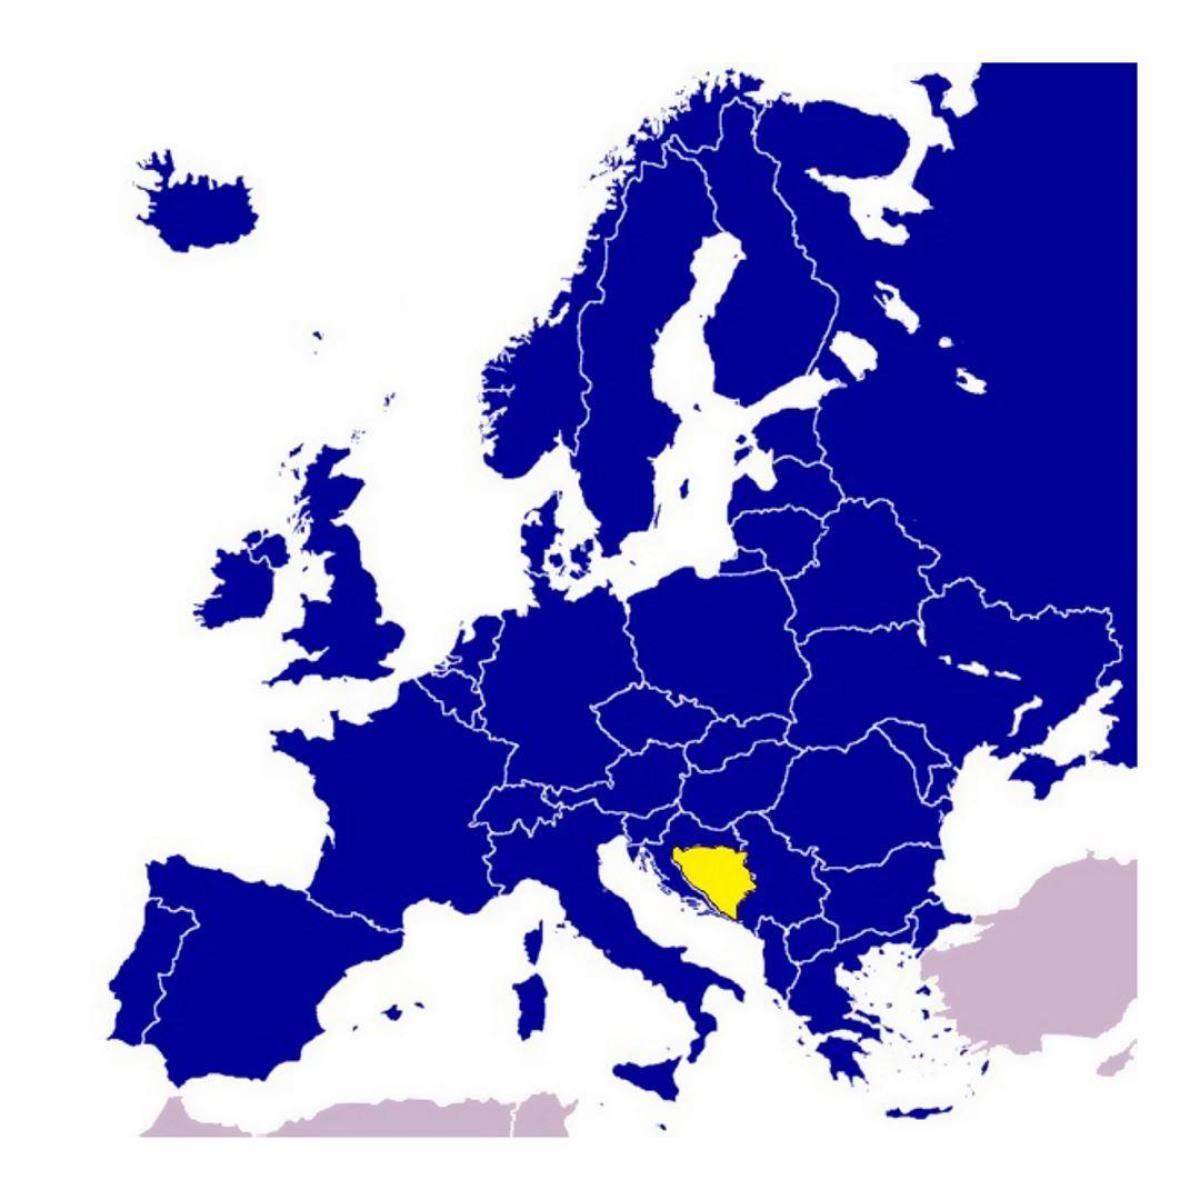 Bosna A Hercegovina Mapa Evropy Mapa Bosny A Hercegoviny Evrope